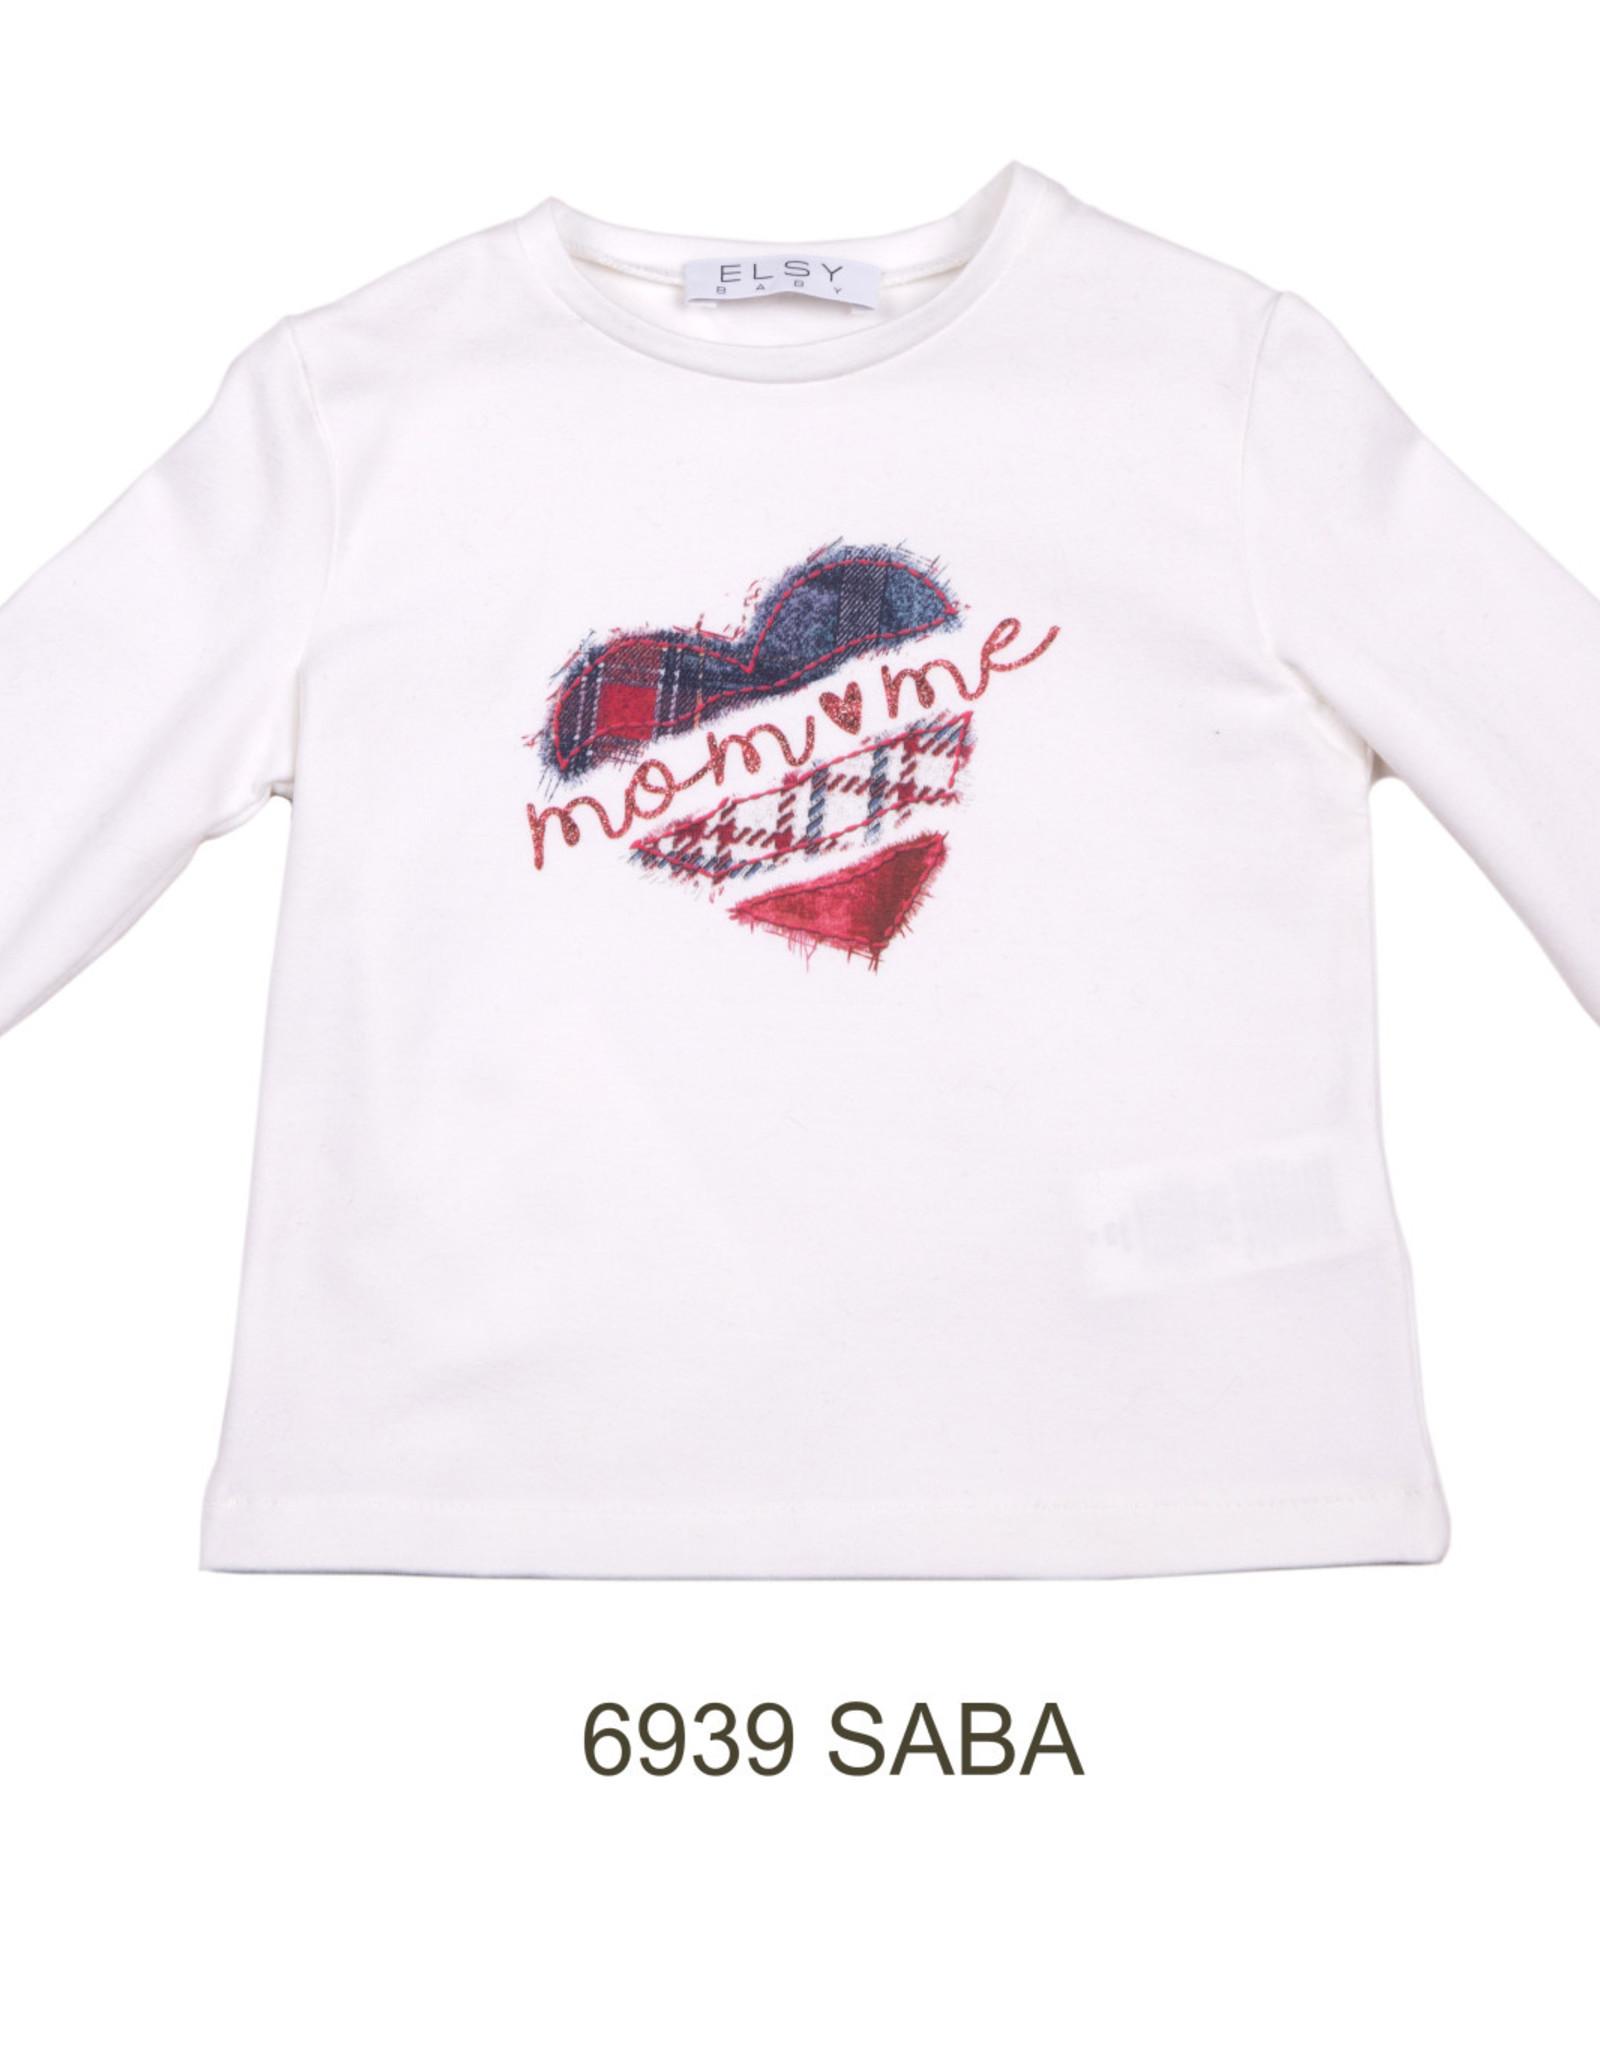 ELSY Saba T-Shirt Jersey Yogurt